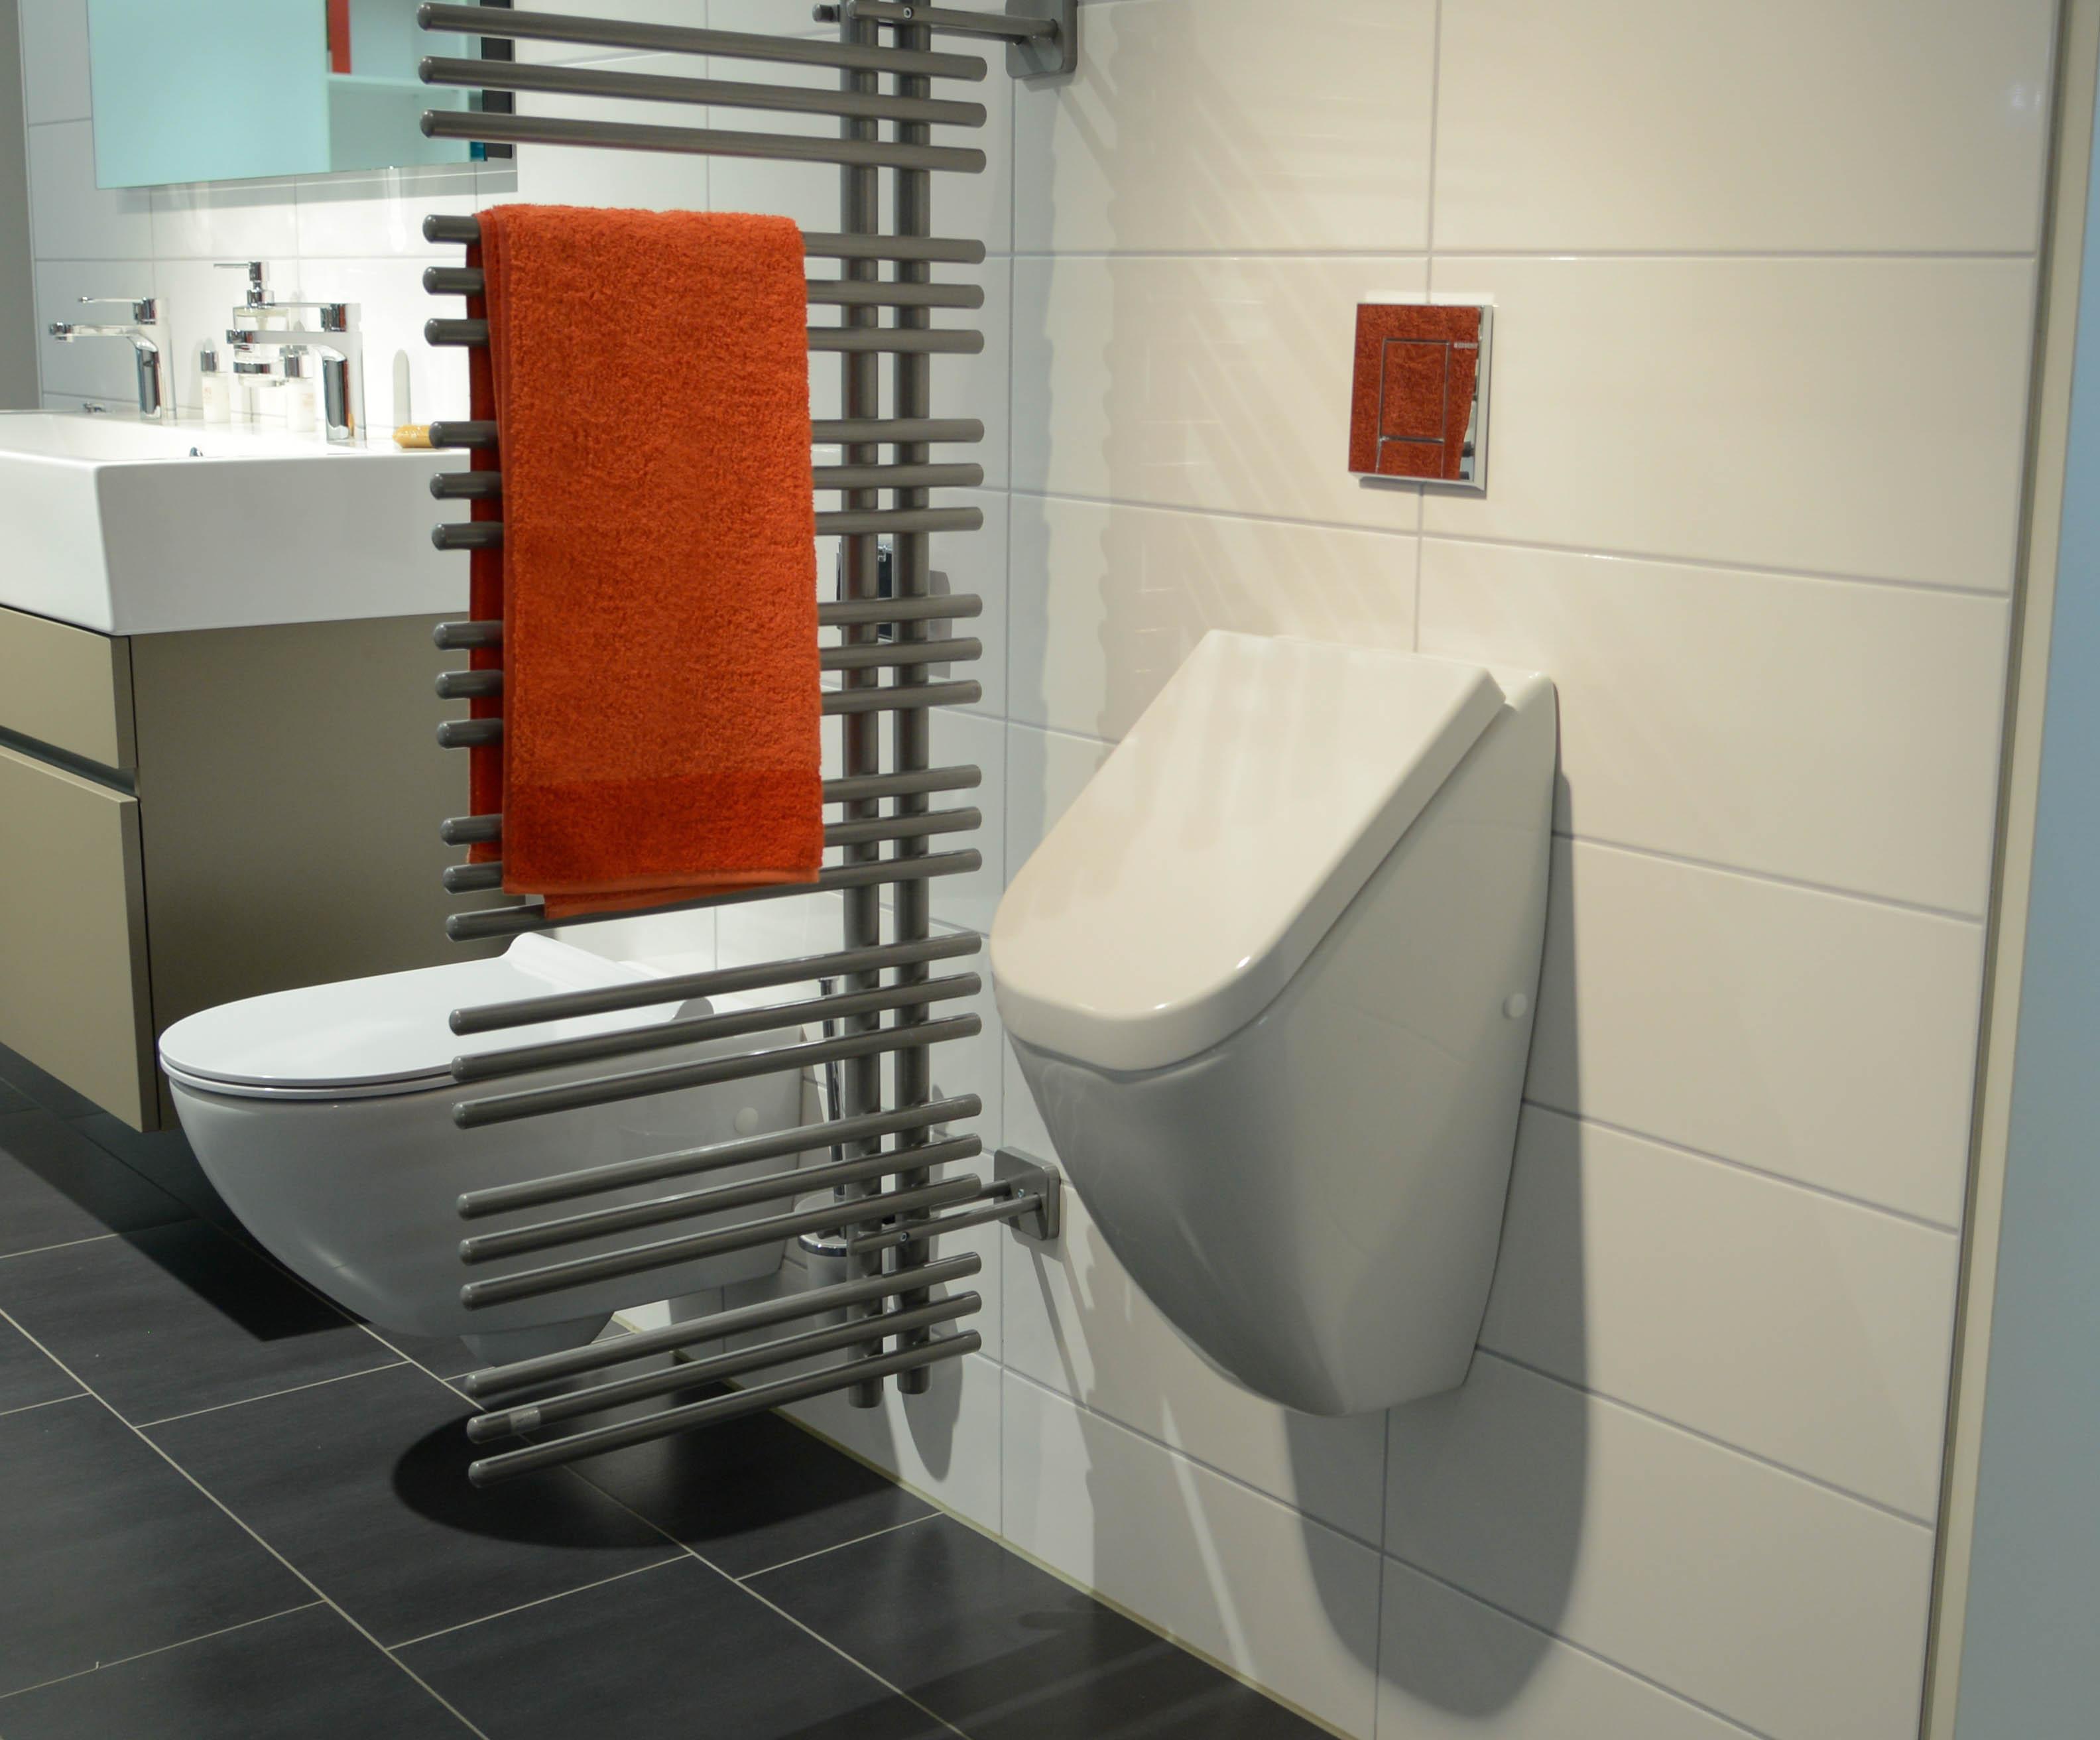 leyendecker heizung sanit r solar tankschutz. Black Bedroom Furniture Sets. Home Design Ideas